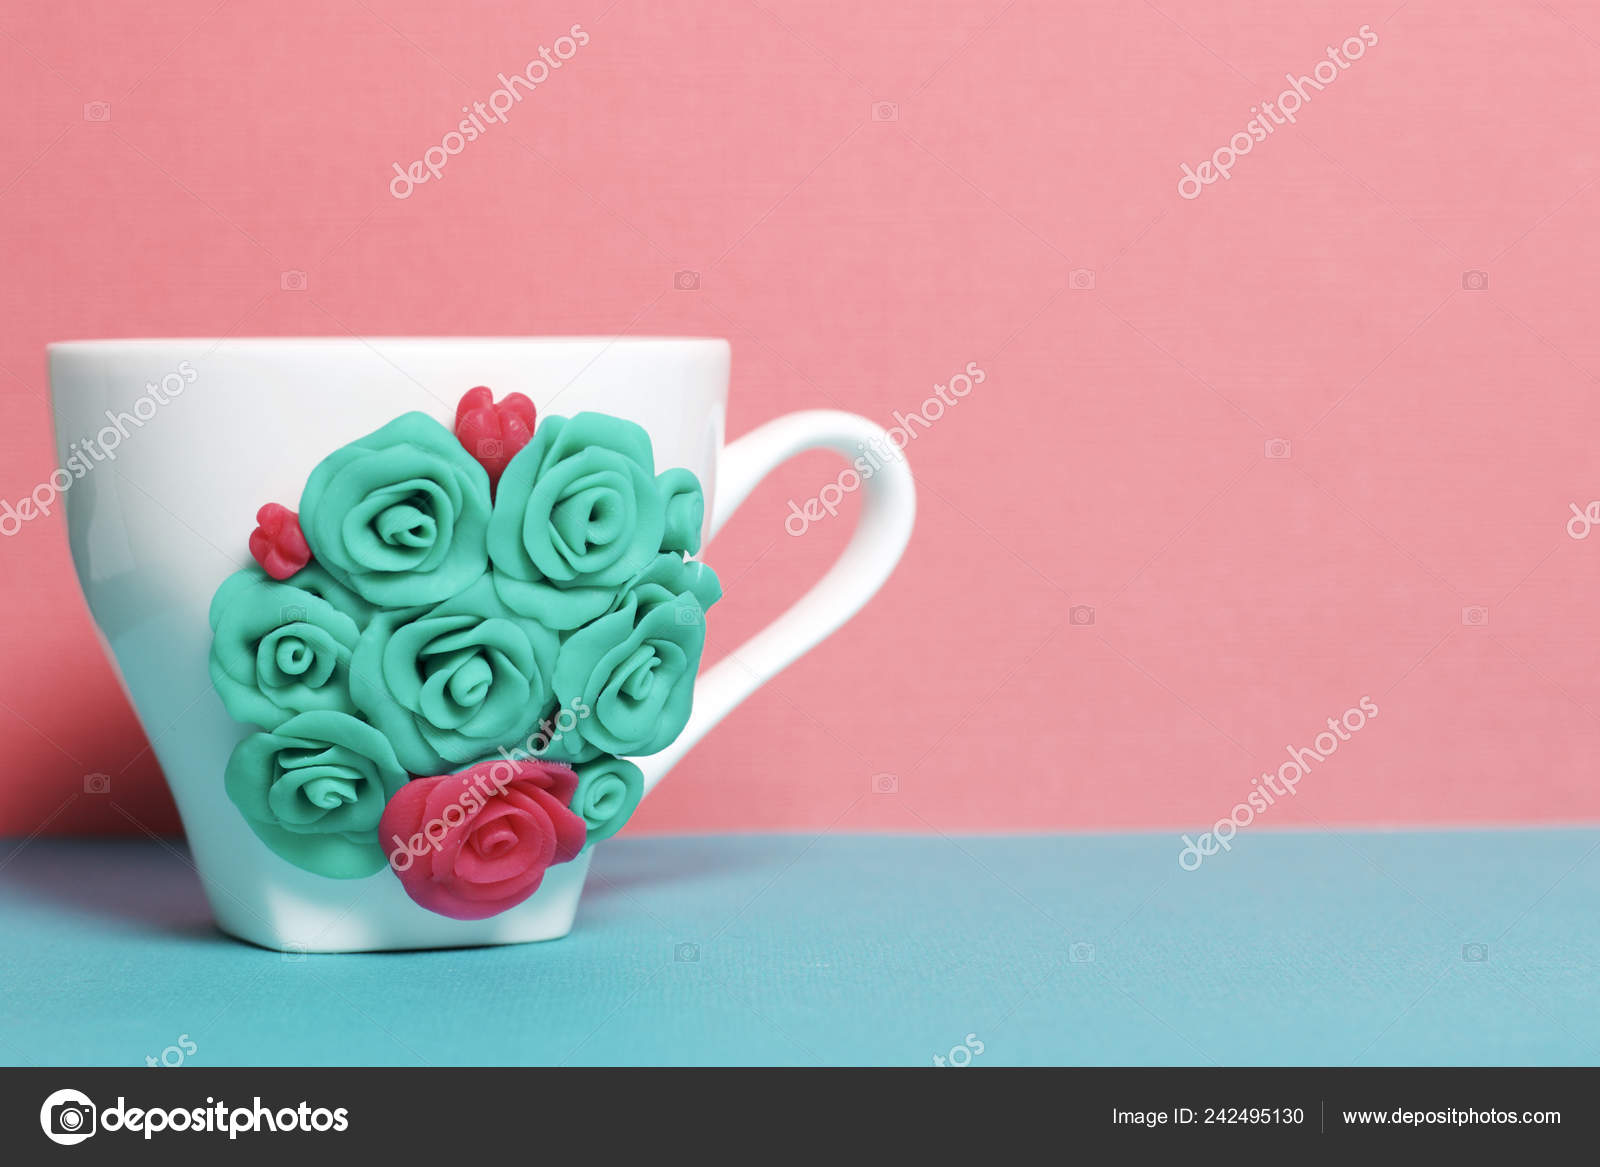 Mug Decorated Flowers Made Polymer Clay Crafts Polymer Clay Mug Stock Photo C Depositvad 242495130